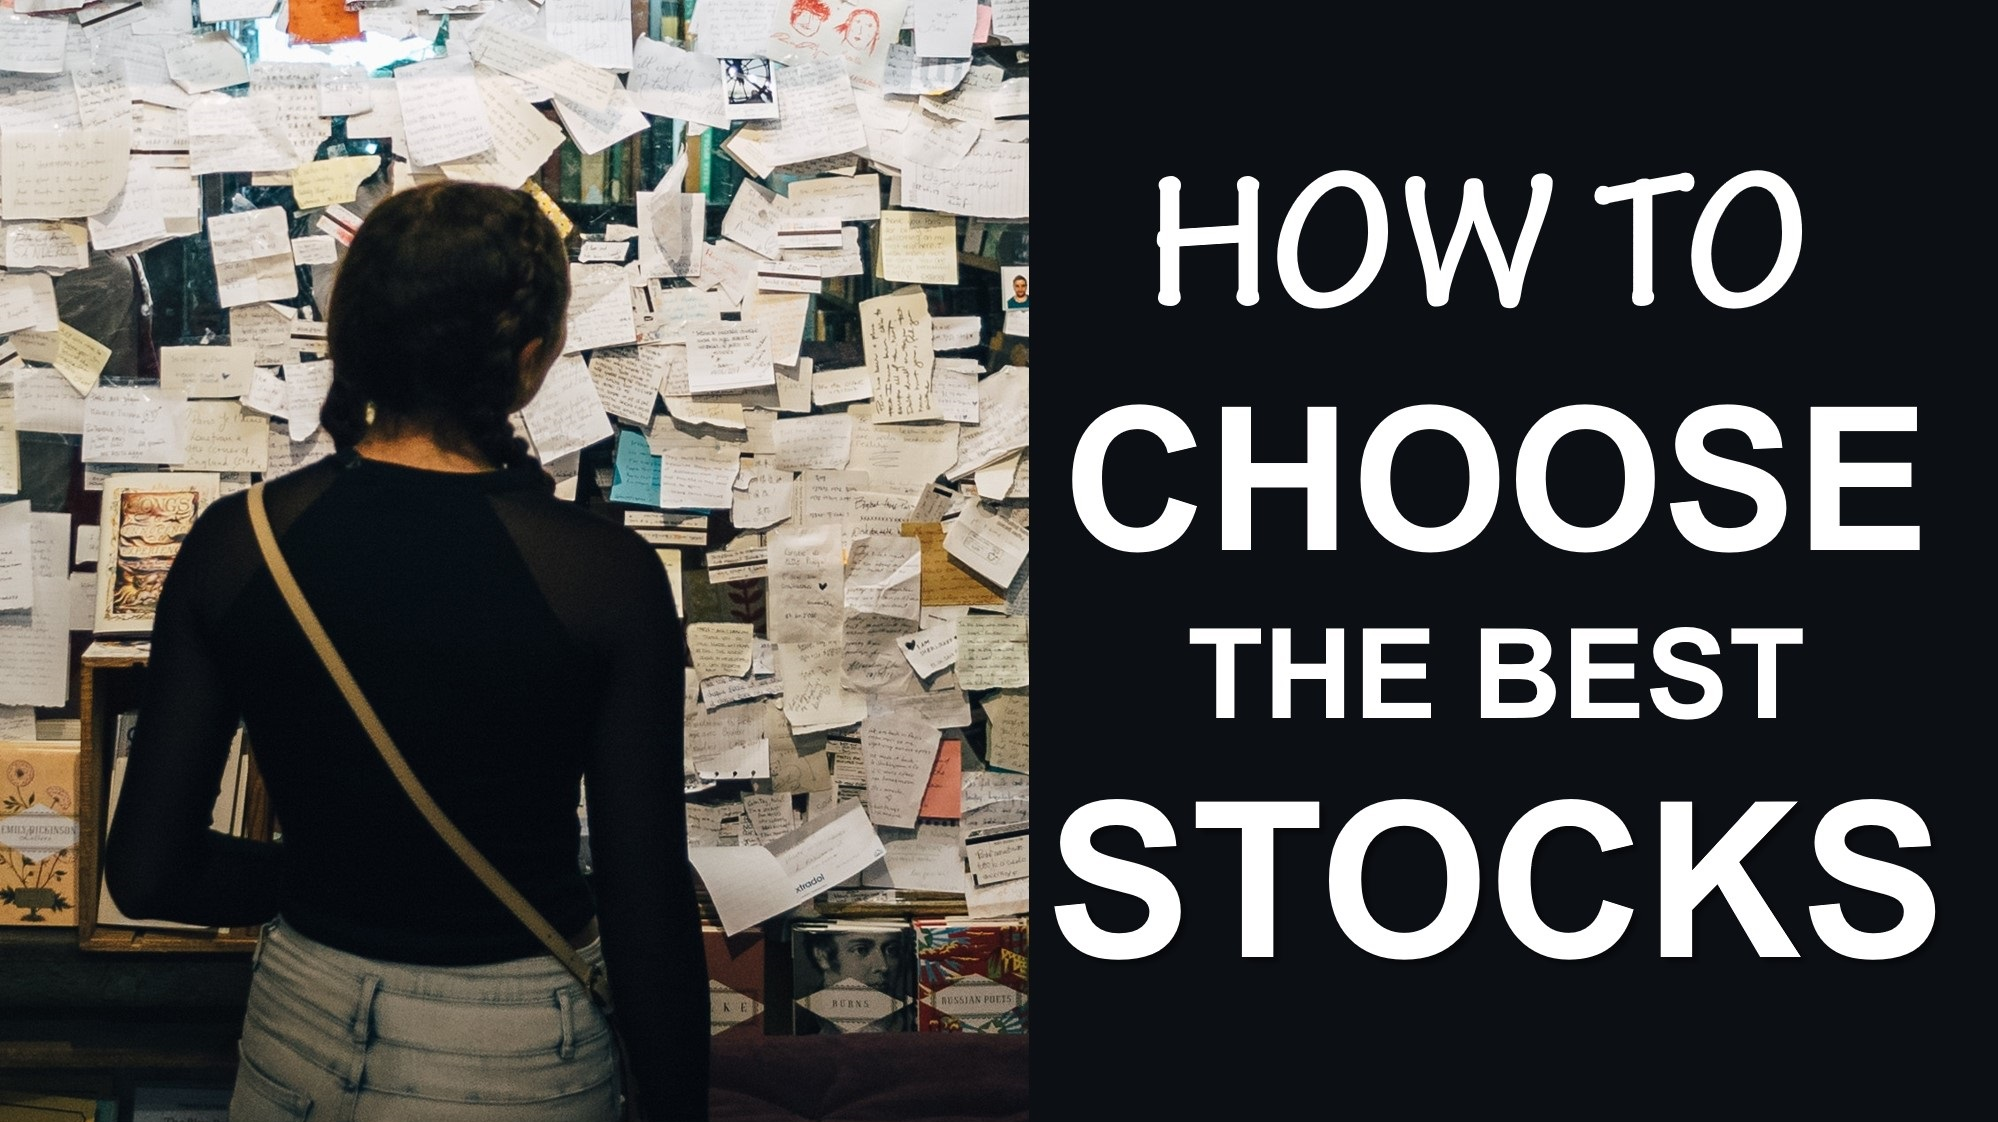 How to choose the best stocks - MoneySmarts